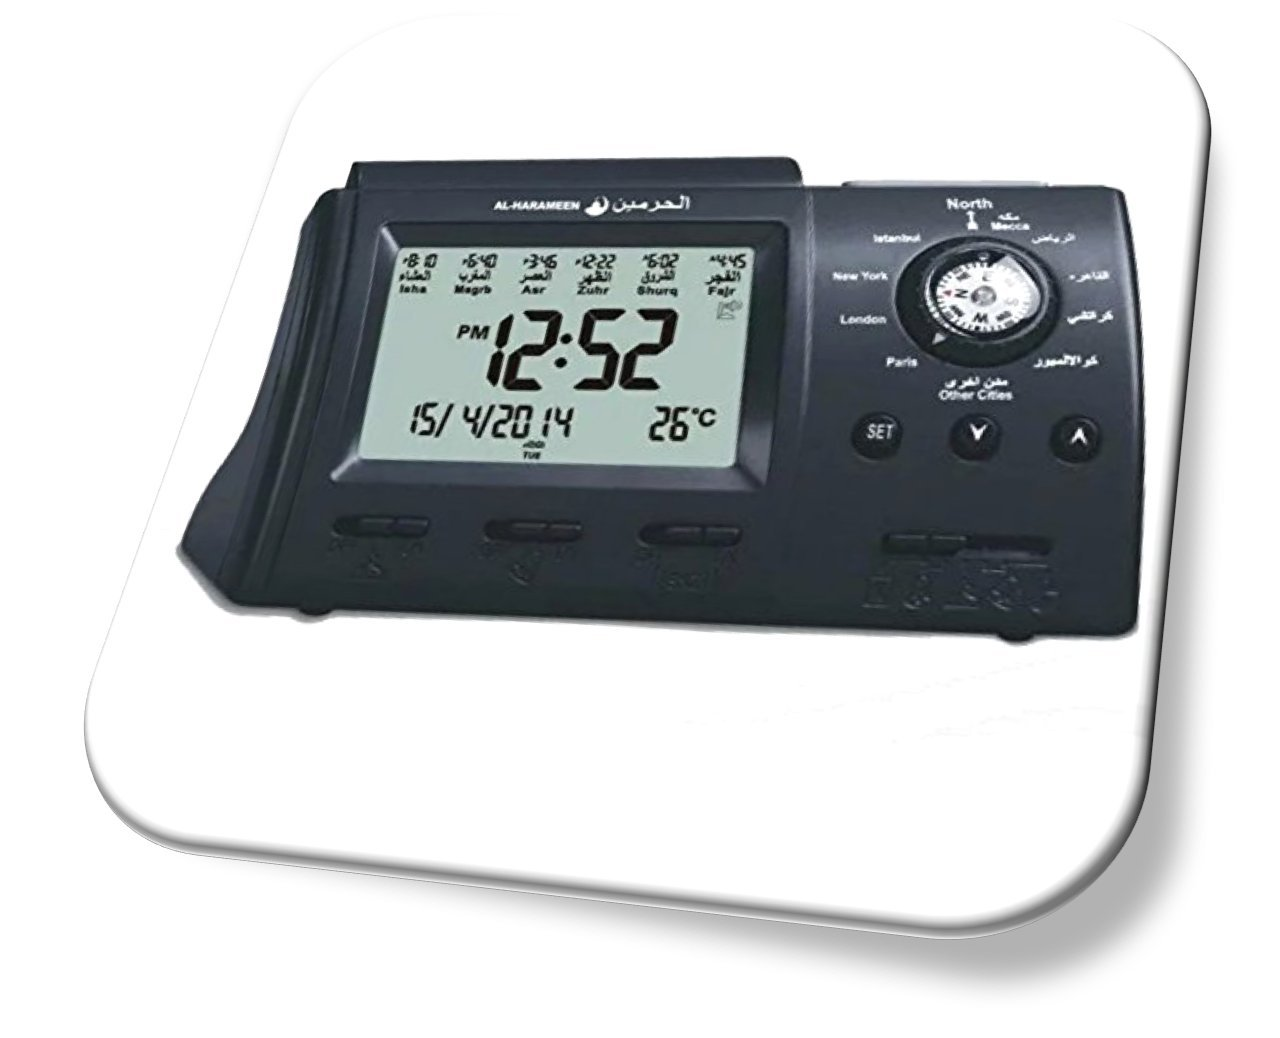 Automatic Islamic Azan Alarm Table Clock Muslim Athan Adhan Qibla Salah Prayer,azan Wall Clock 3005